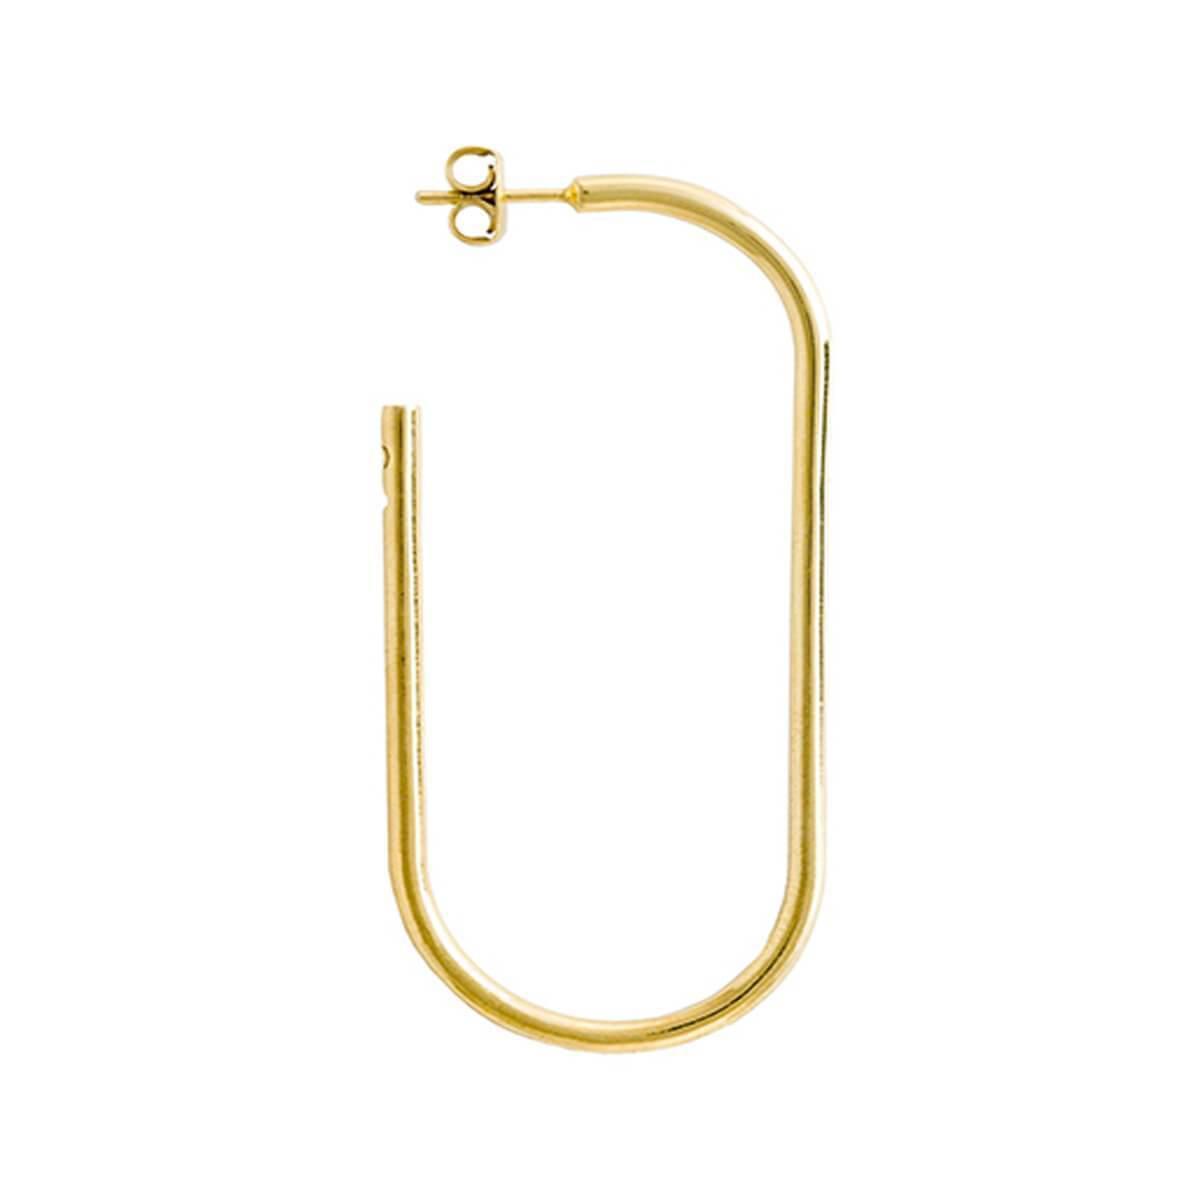 Glenda Lopez 18kt Gold Dipped Small Golden Link Earring Gwsb2gBlA